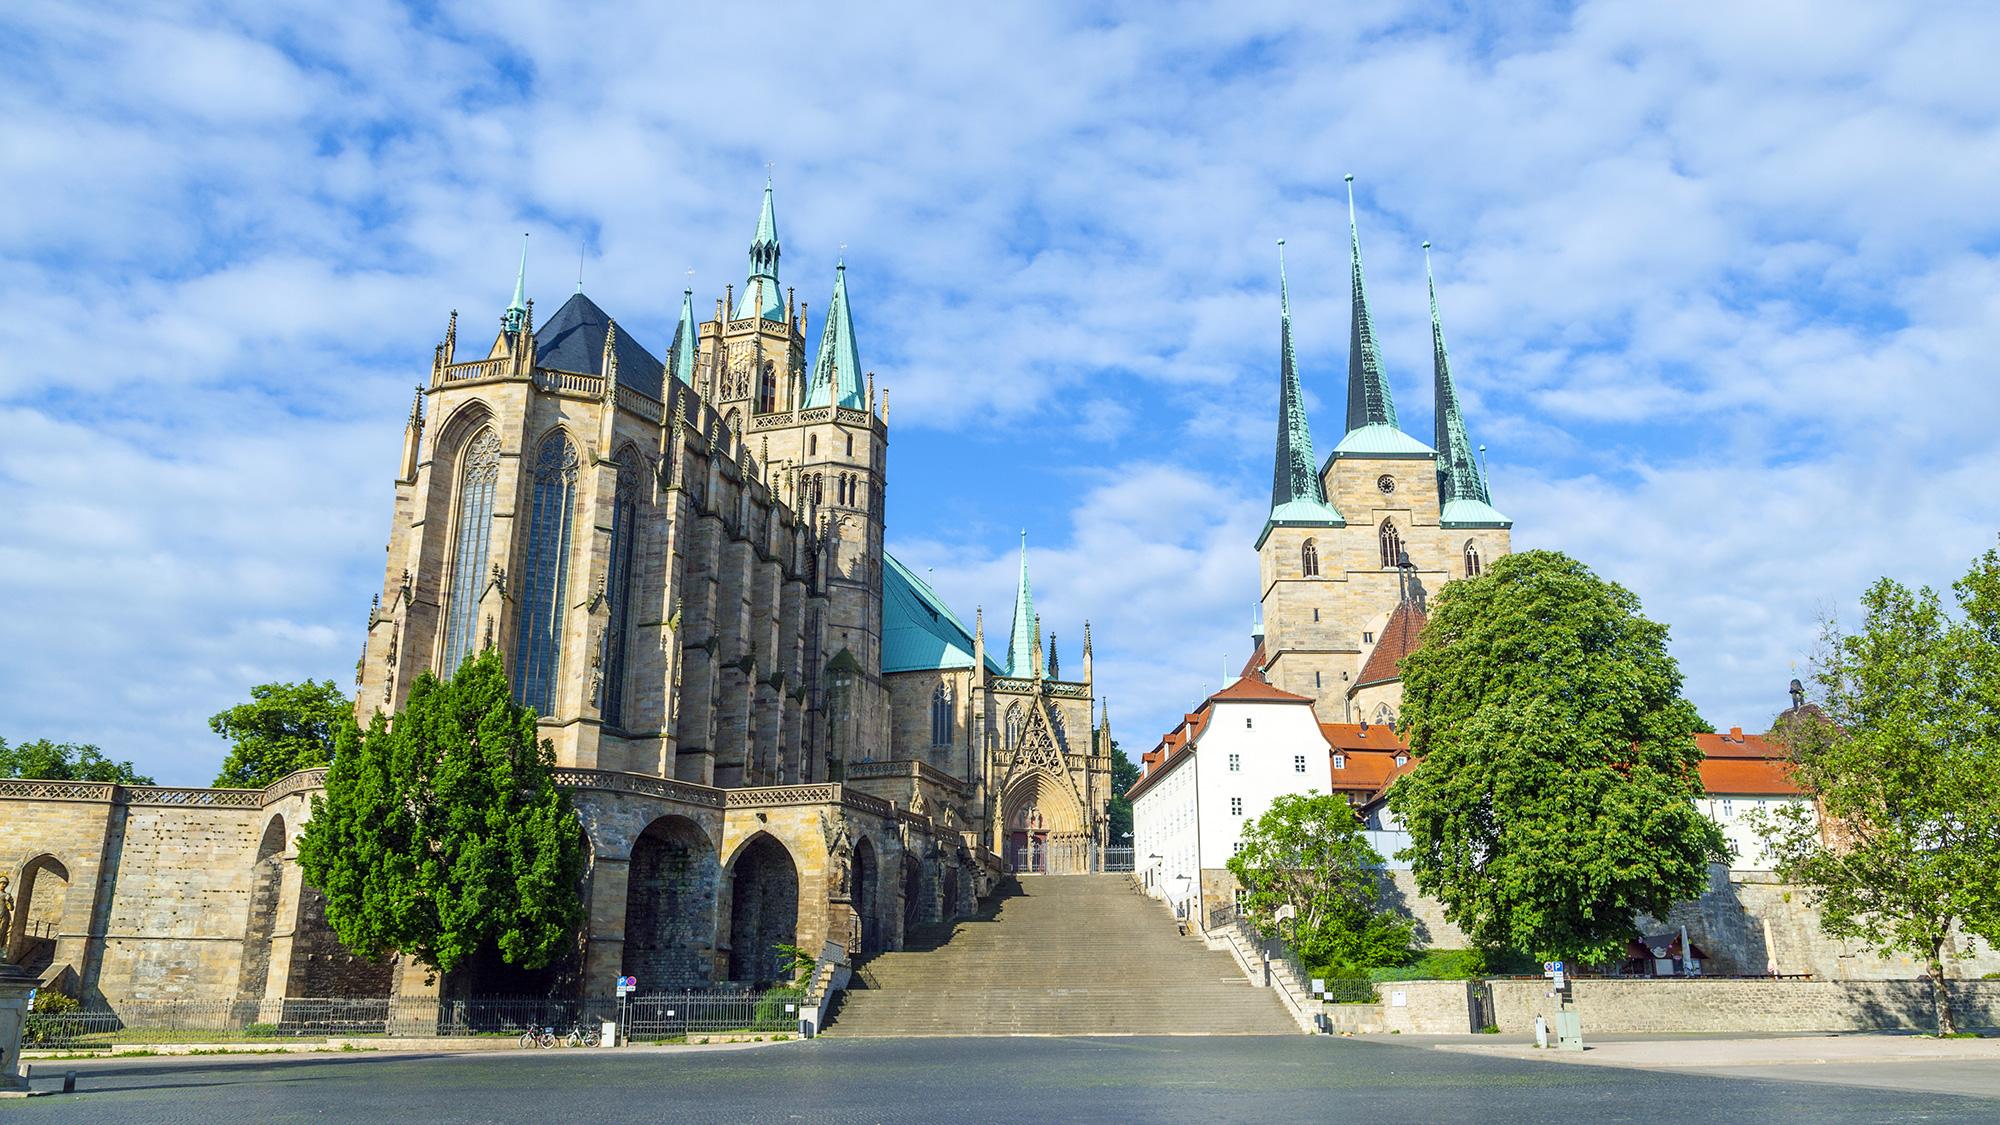 Media Mobil Erfurt media mobil erfurt die history tour machte station im